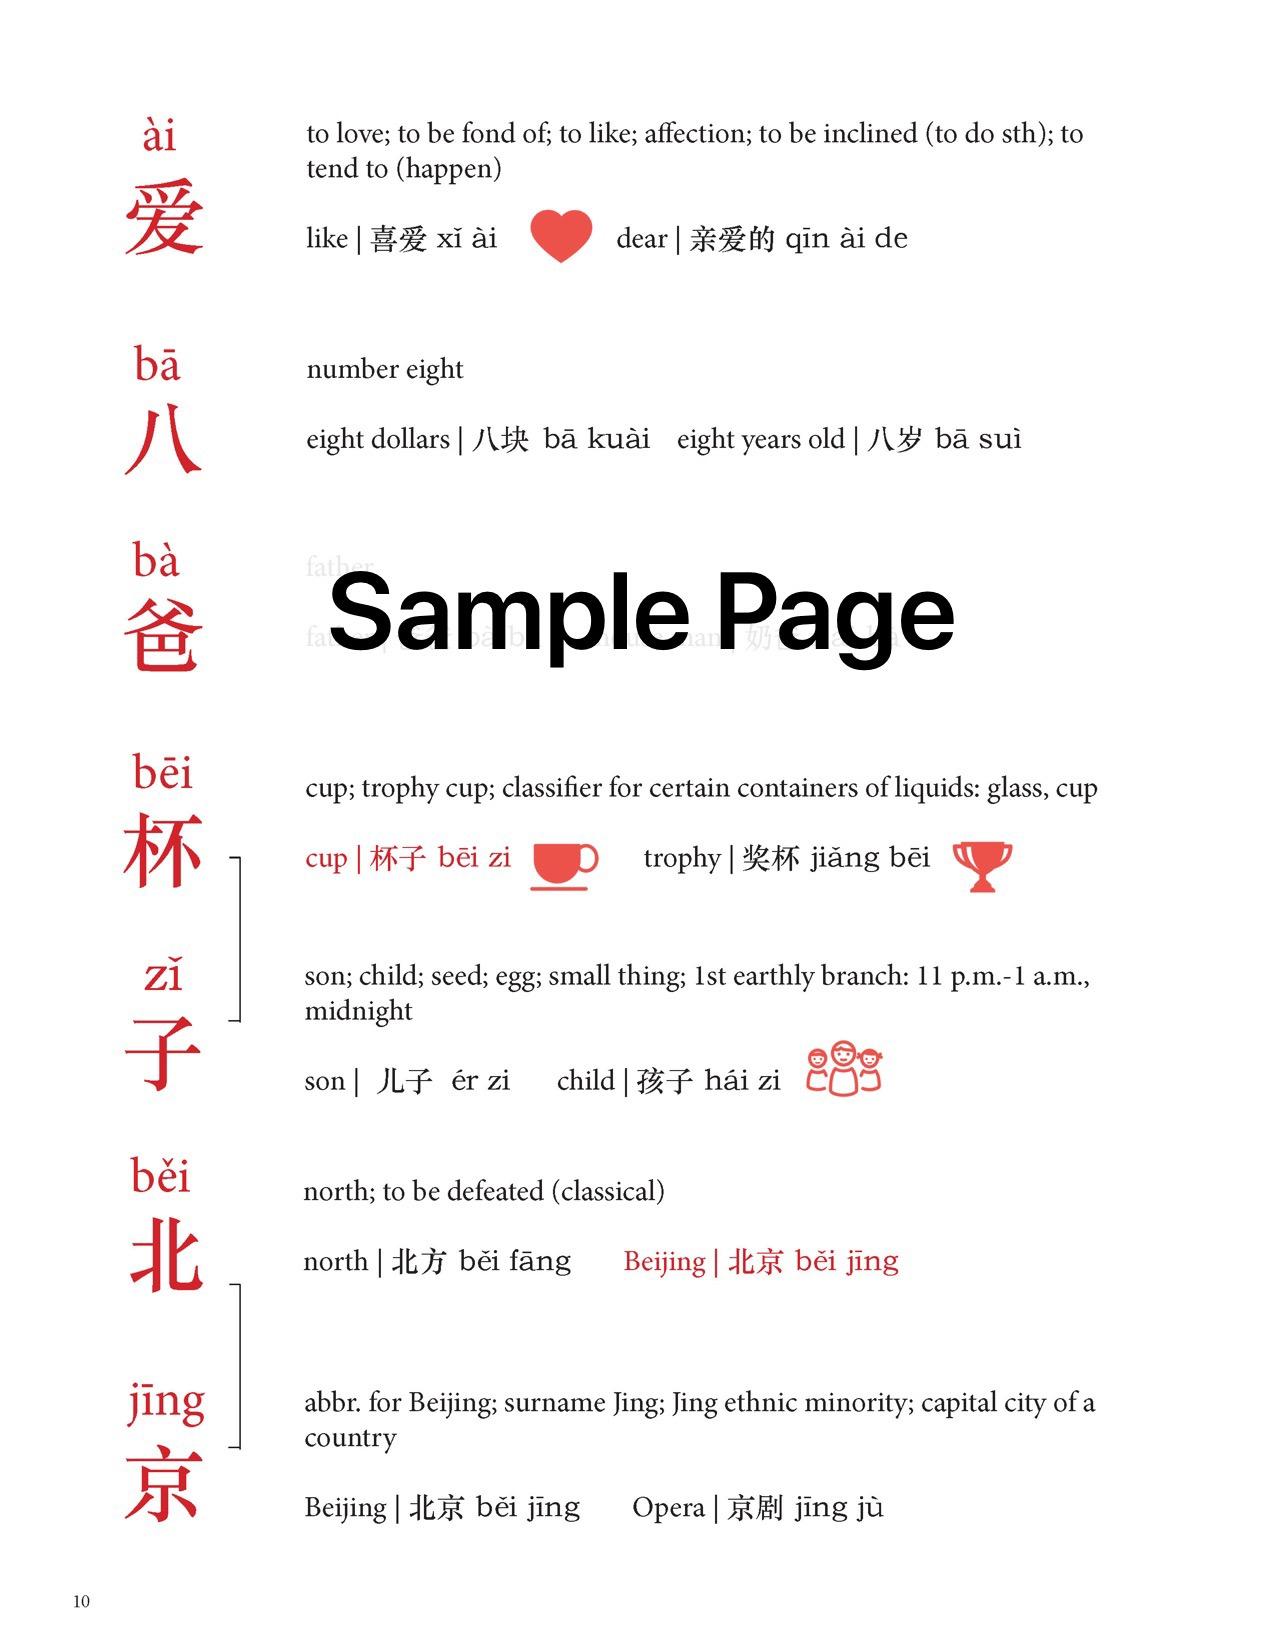 HSK Chinese Character Workbook - Inner Page Sample.jpg